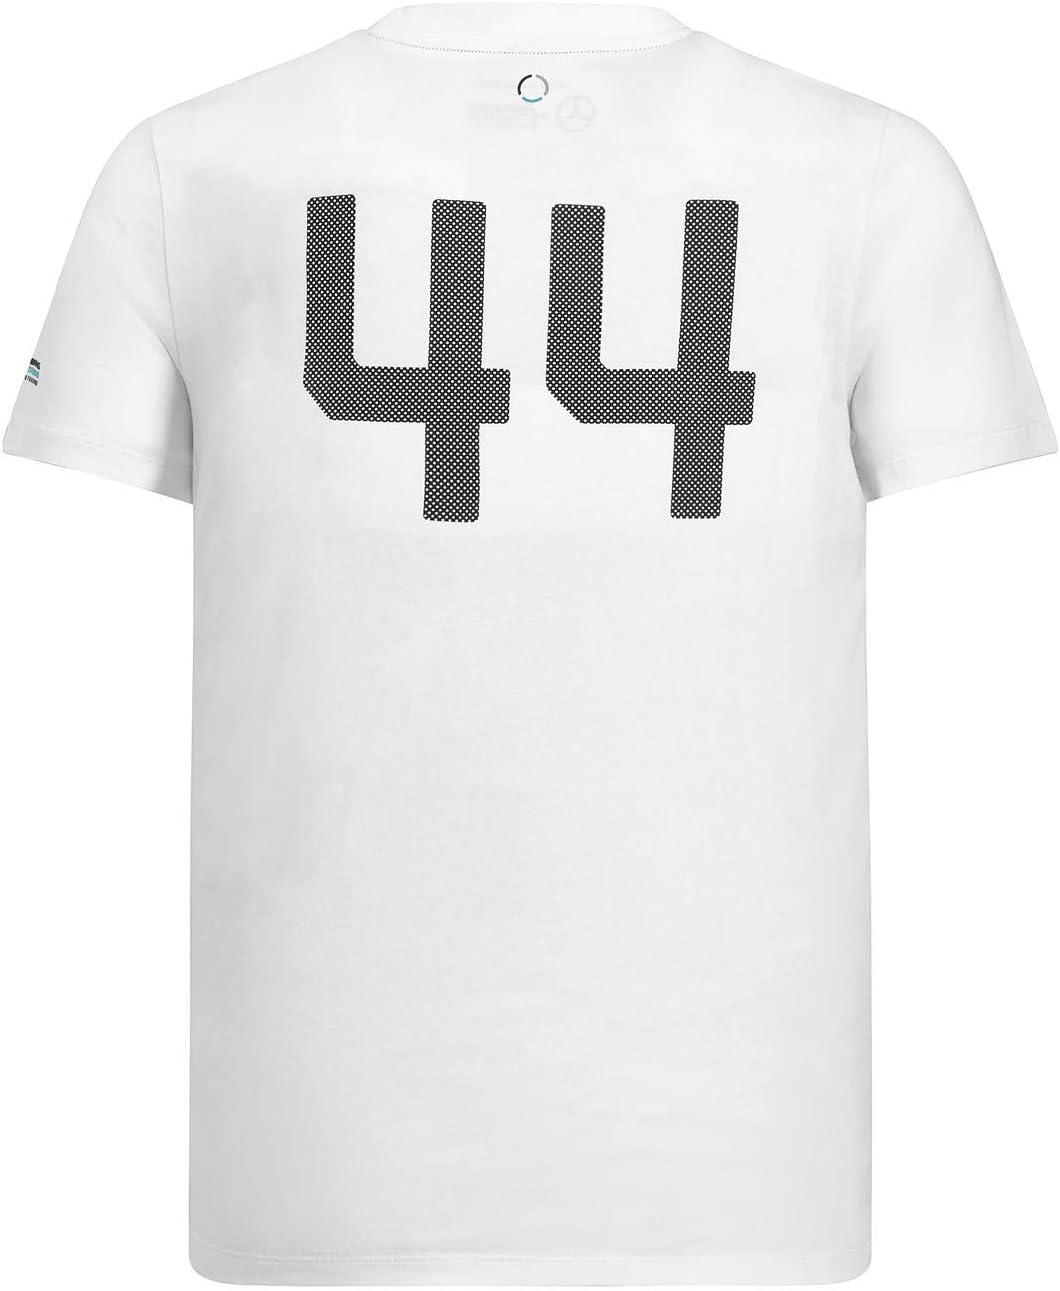 2018 Mercedes-AMG F1 Lewis Hamilton Mens Logo T-Shirt Formula 1 Team